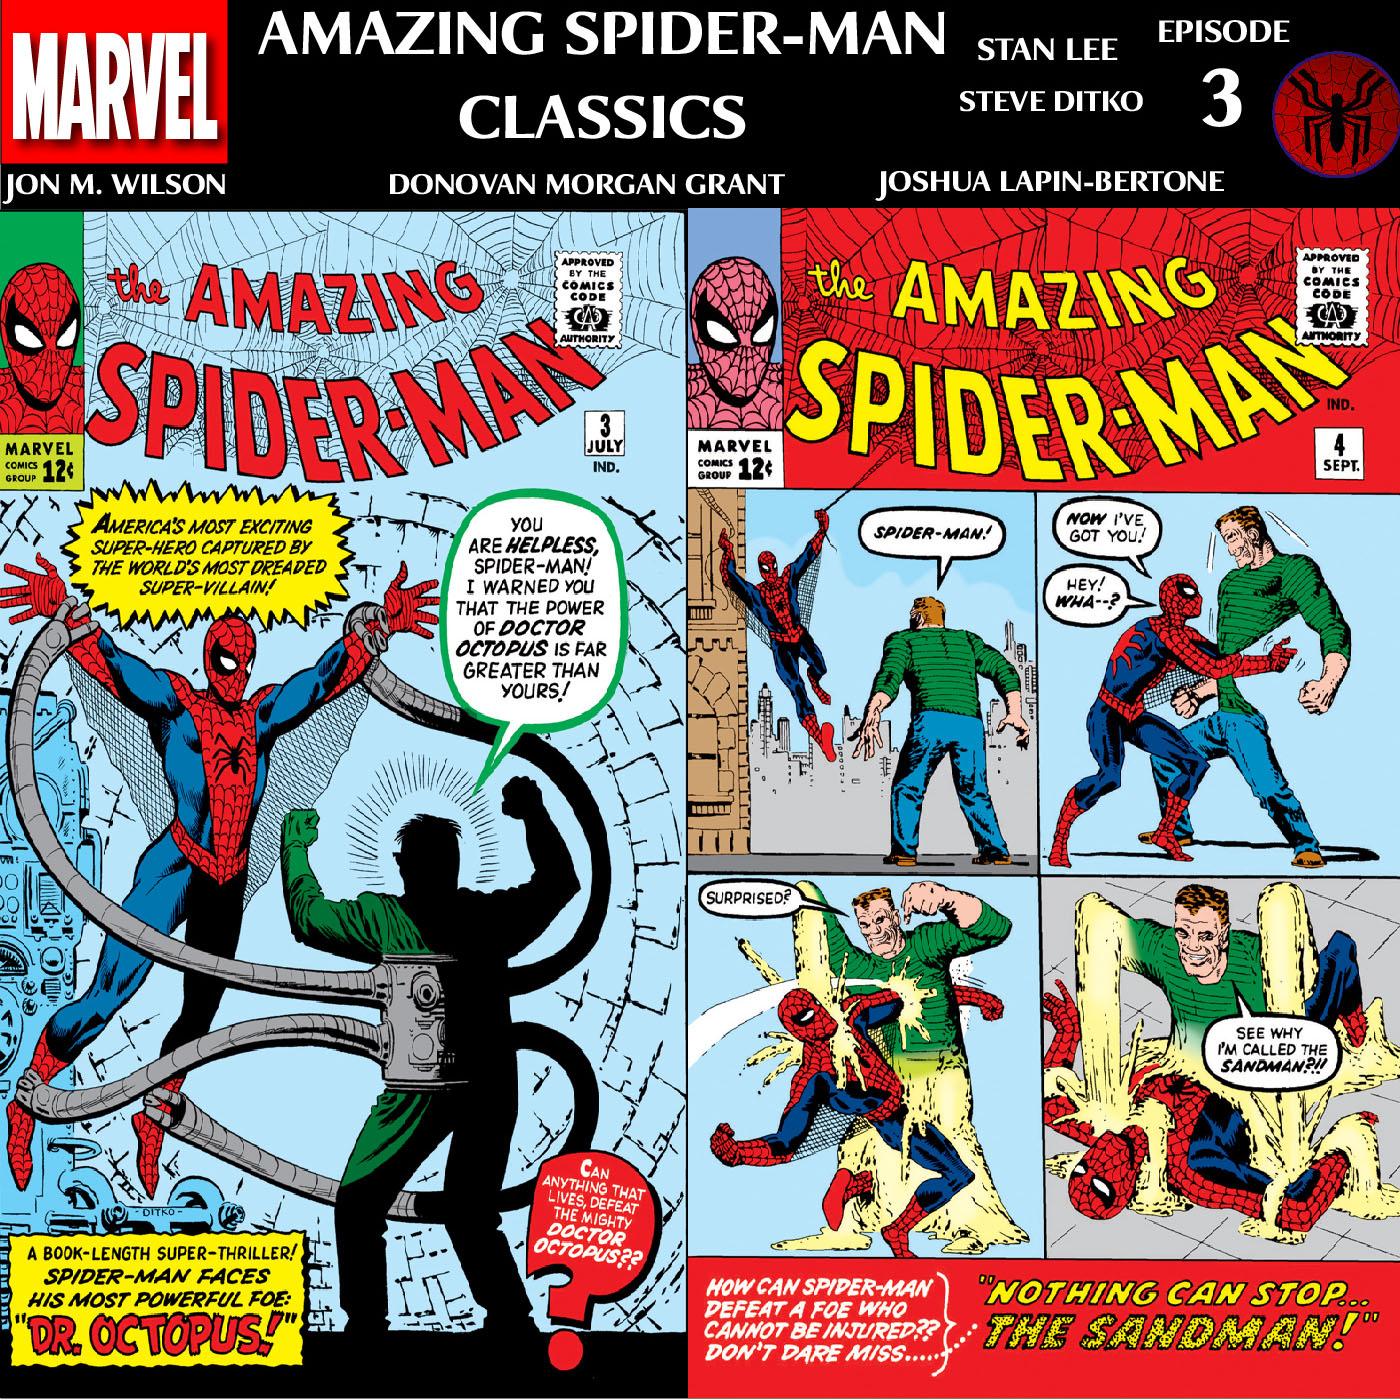 Amazing Spider-Man Classics Episode 3: Amazing Spider-Man 3 and 4